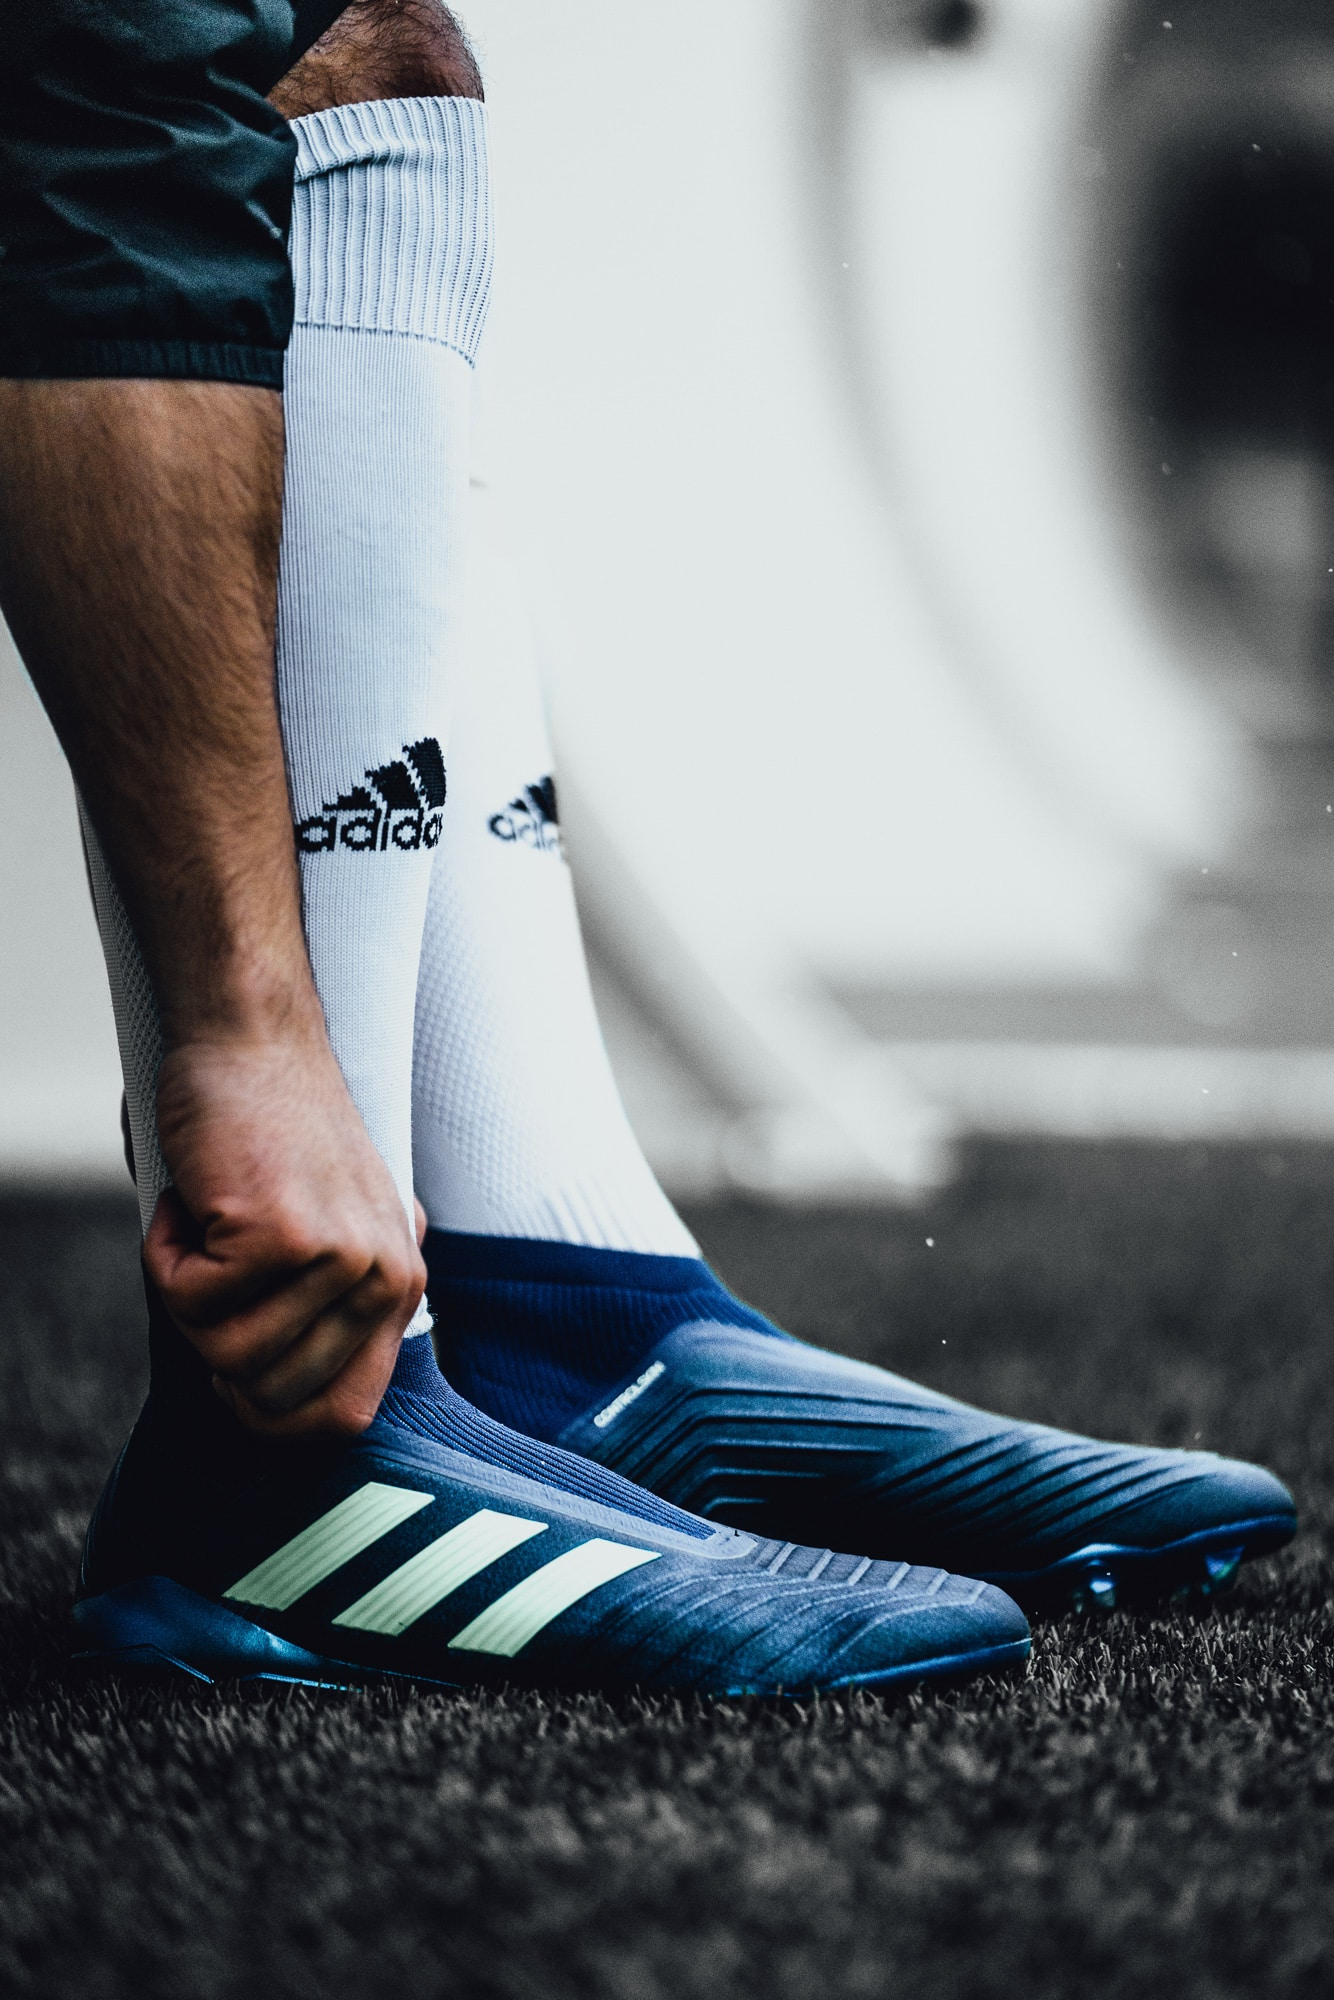 chaussure-football-adidas-predator-deadly-strike-mars-2018-3